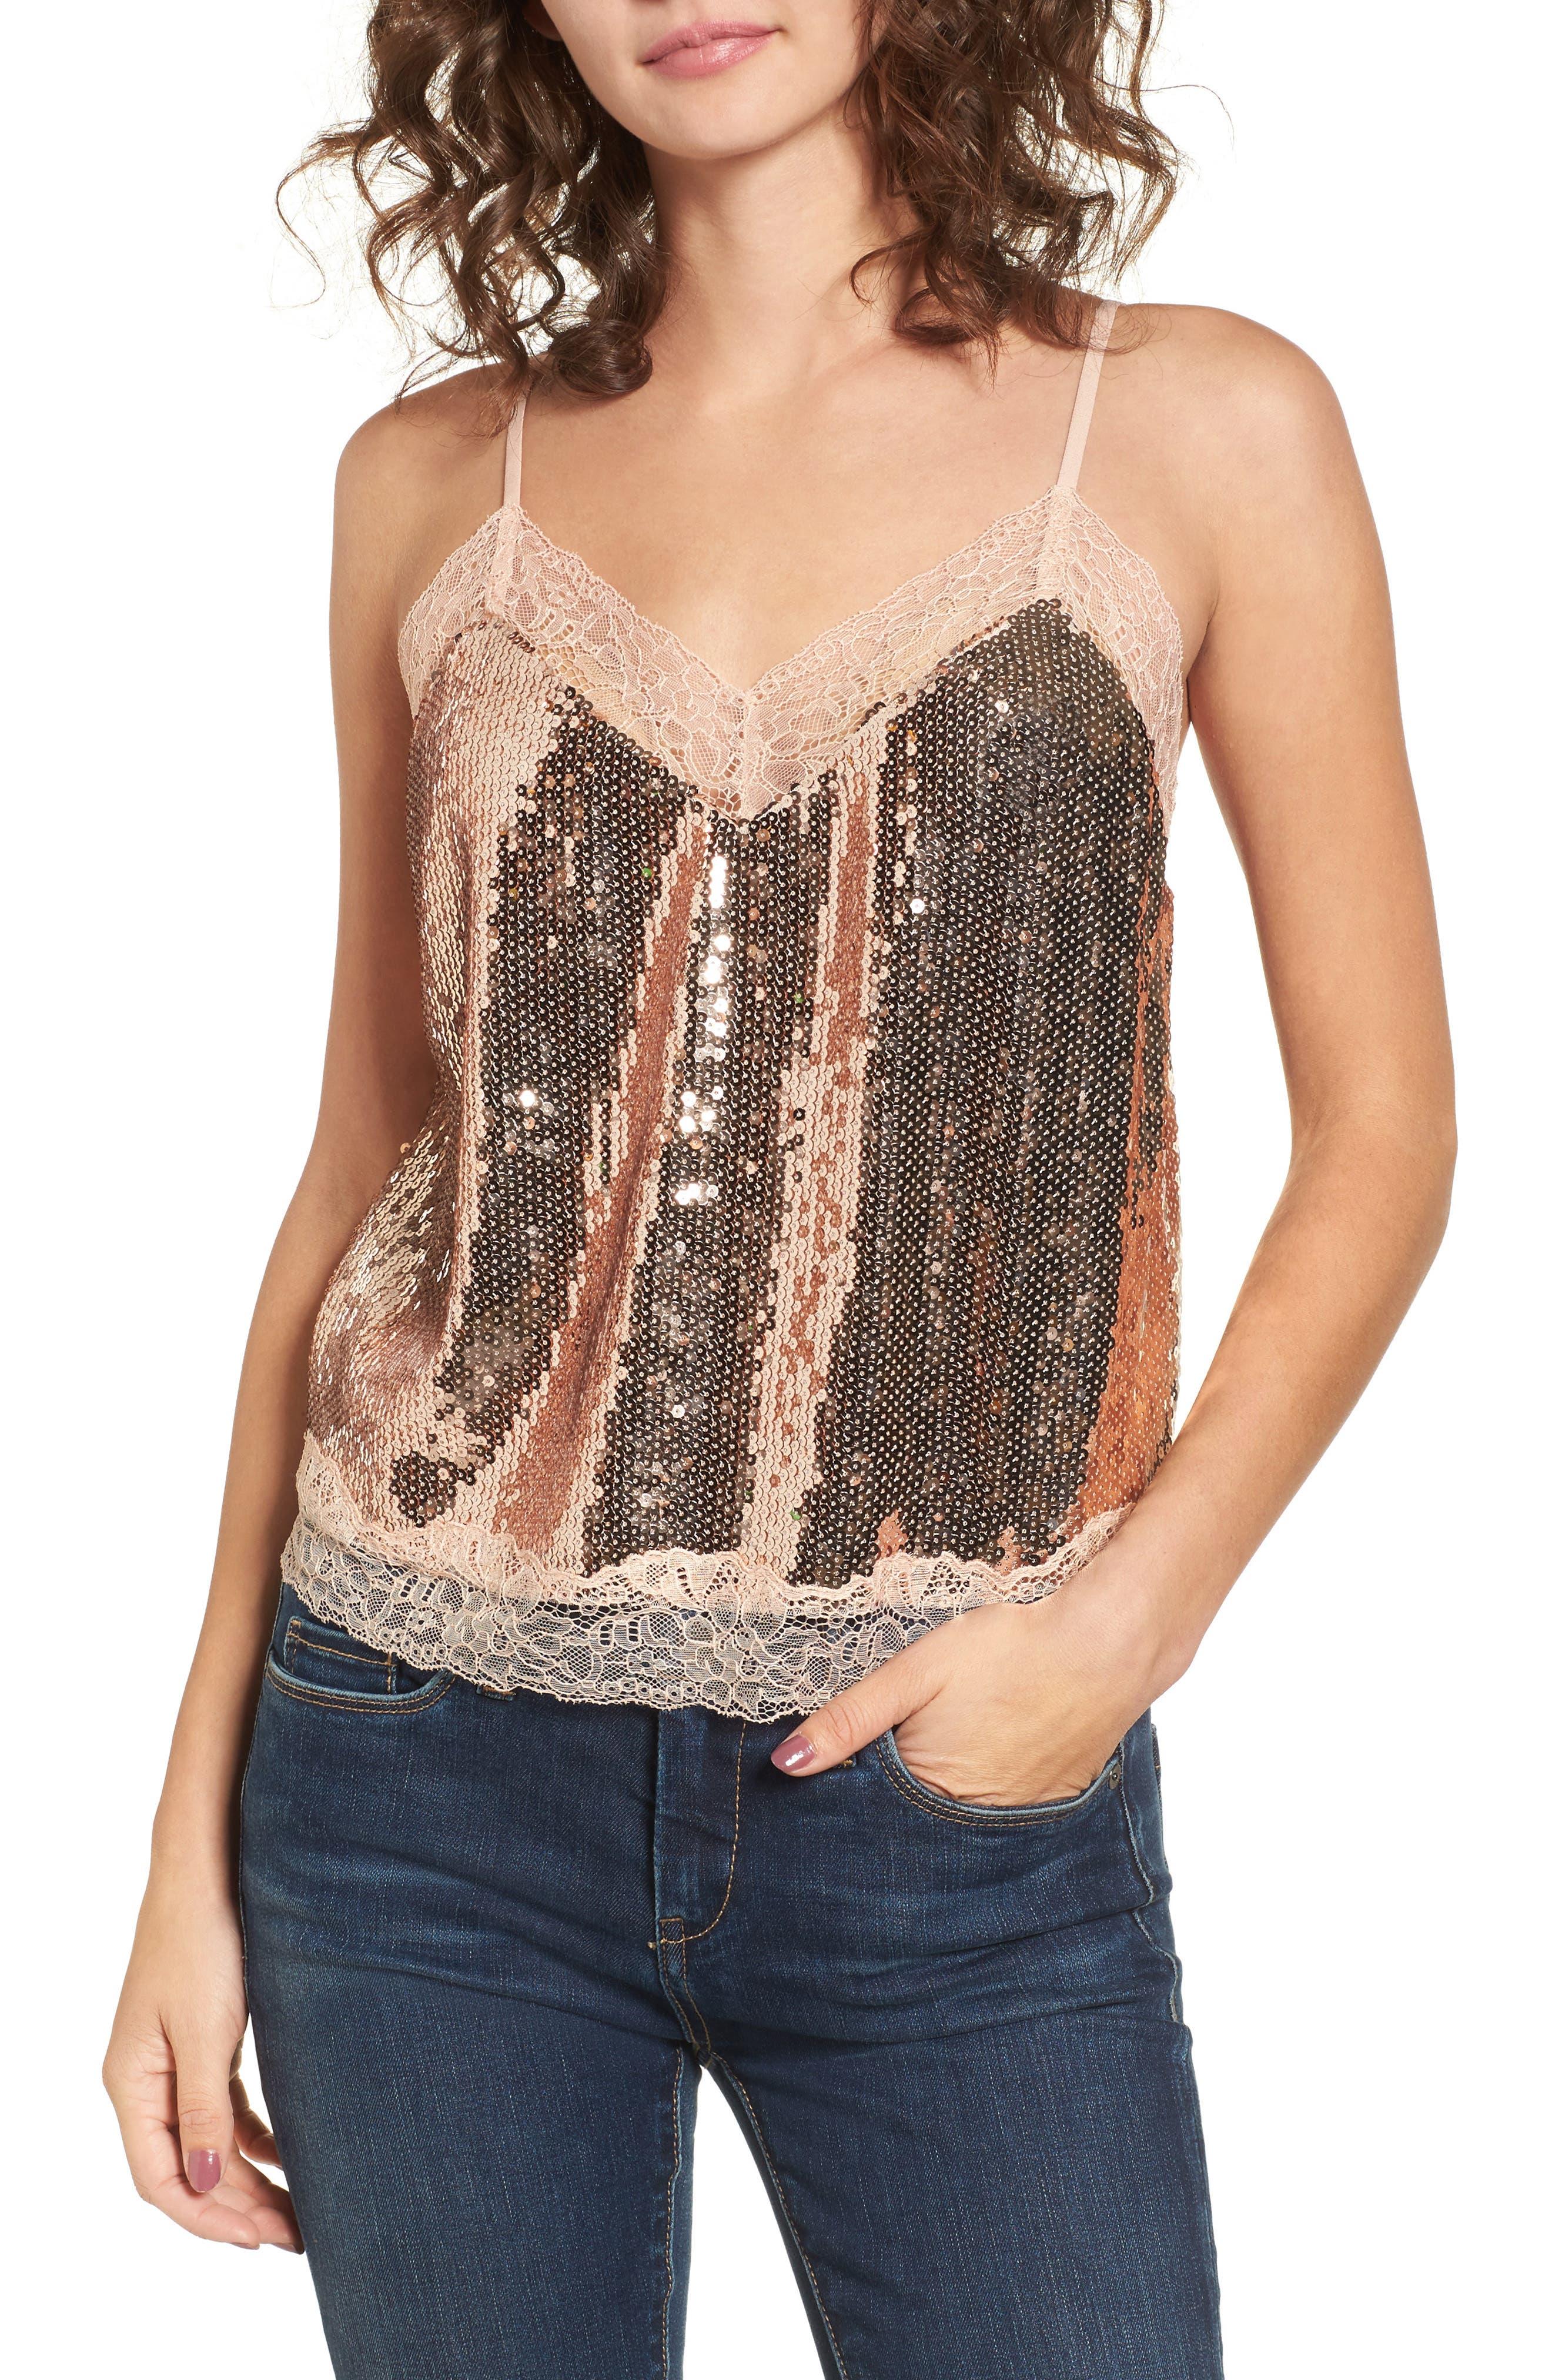 Main Image - Soprano Lace Trim Sequin Camisole Top